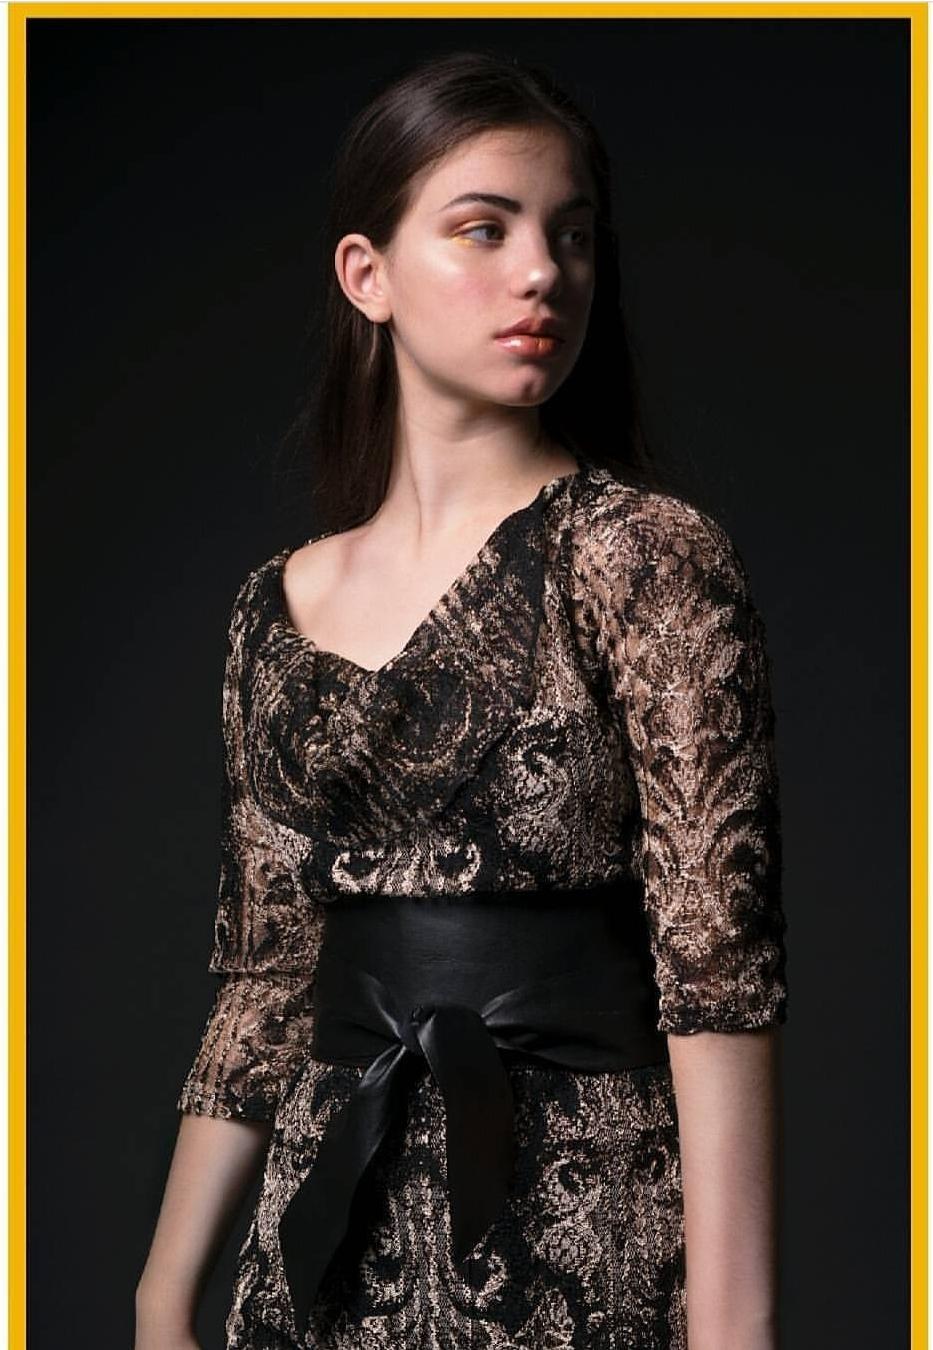 [Model: Kaya Geha]